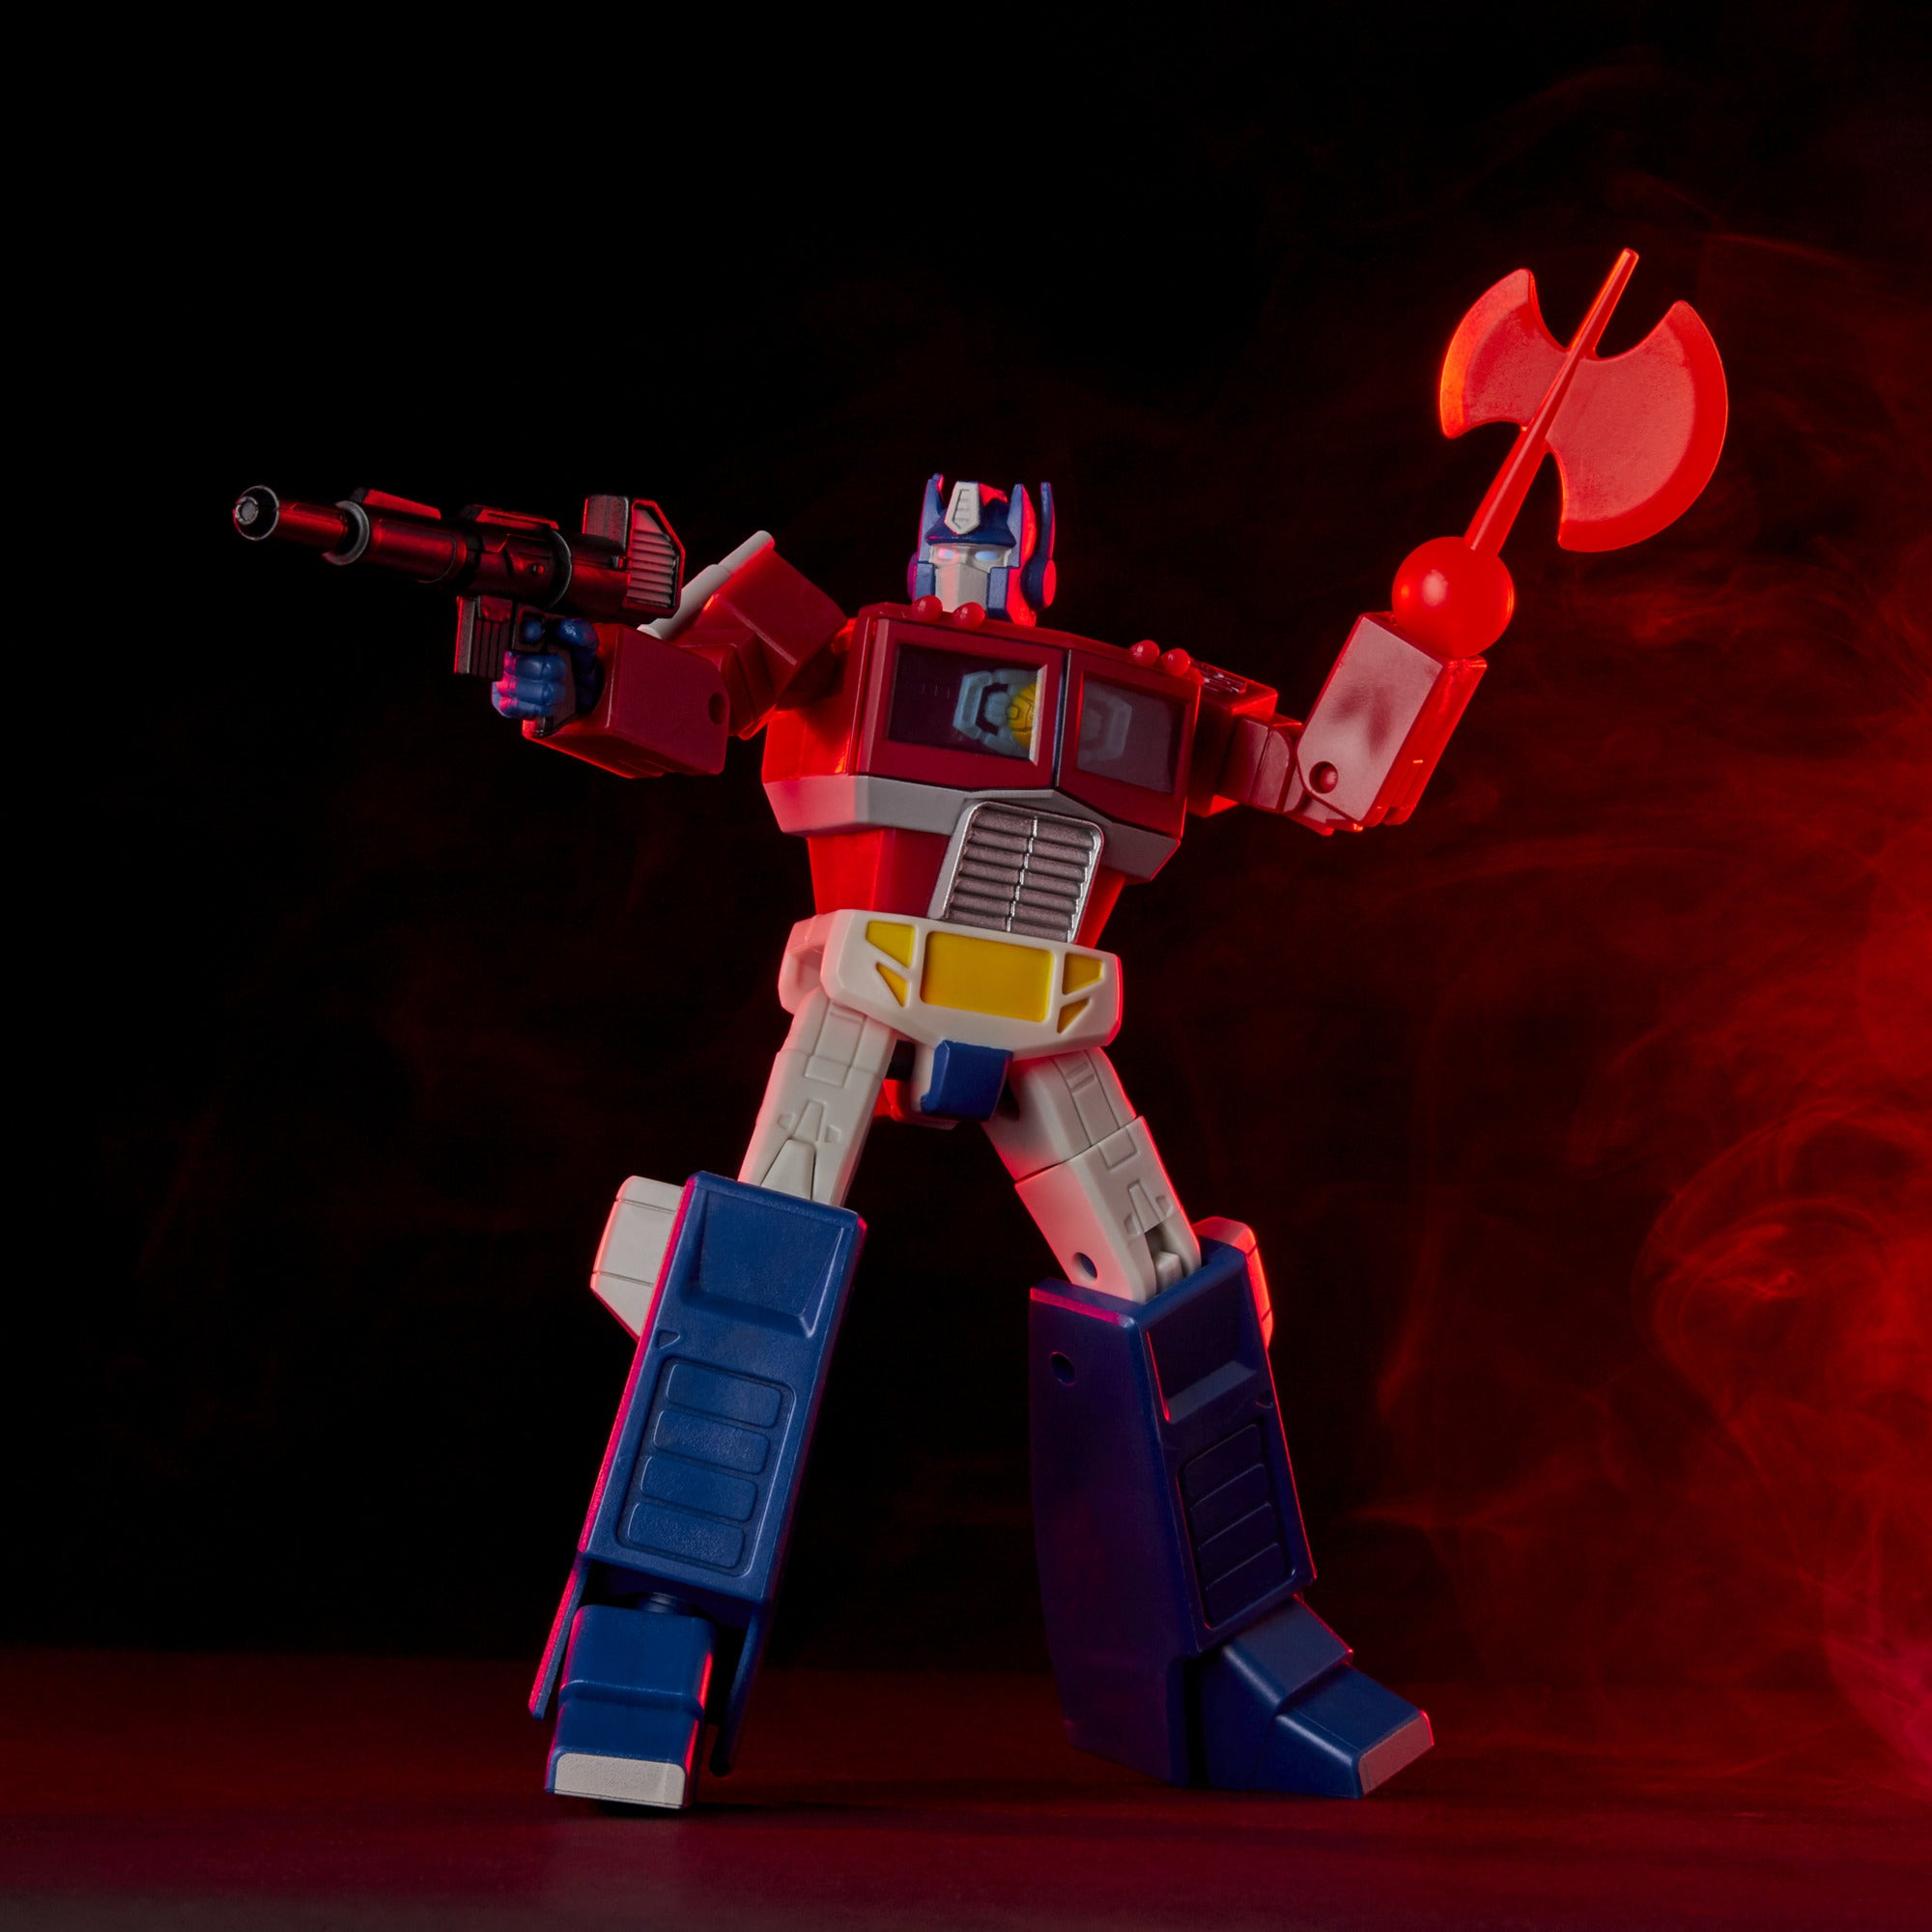 Transformers Mini Figures lot of and Megatron new 02 Optimus Prime